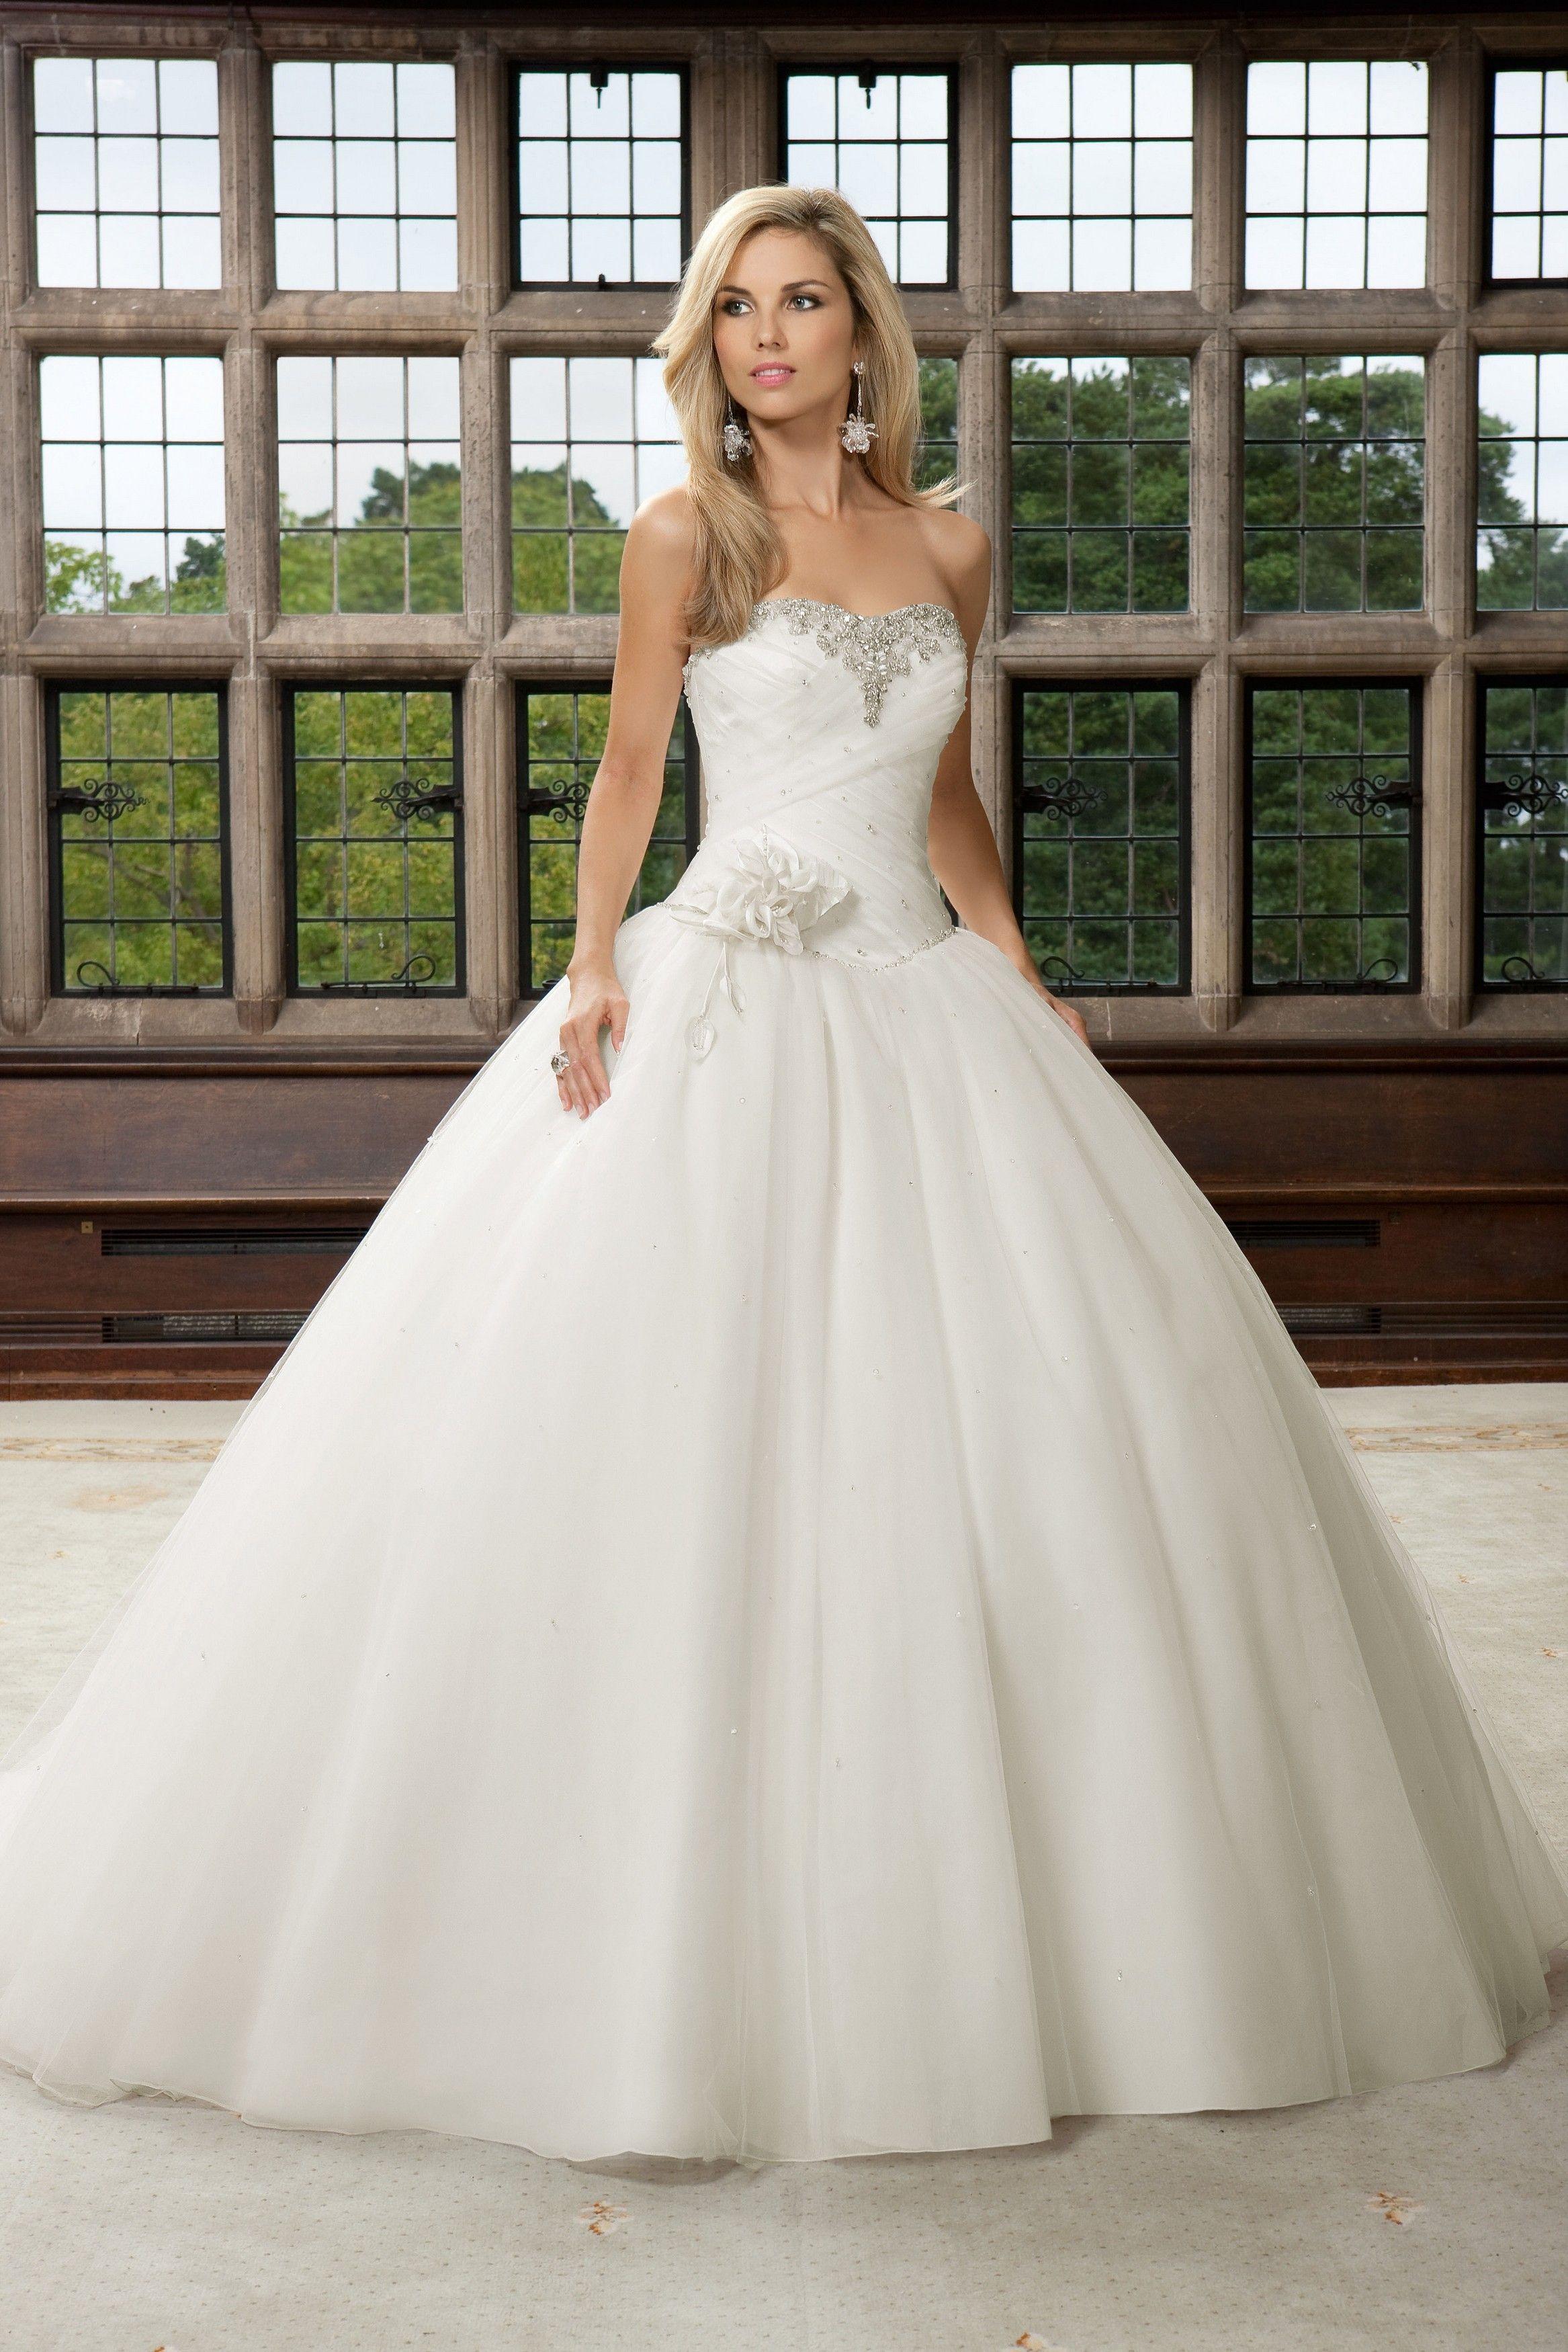 Dress up of cinderella - Cinderella Wedding Dress By Ronald Joyce